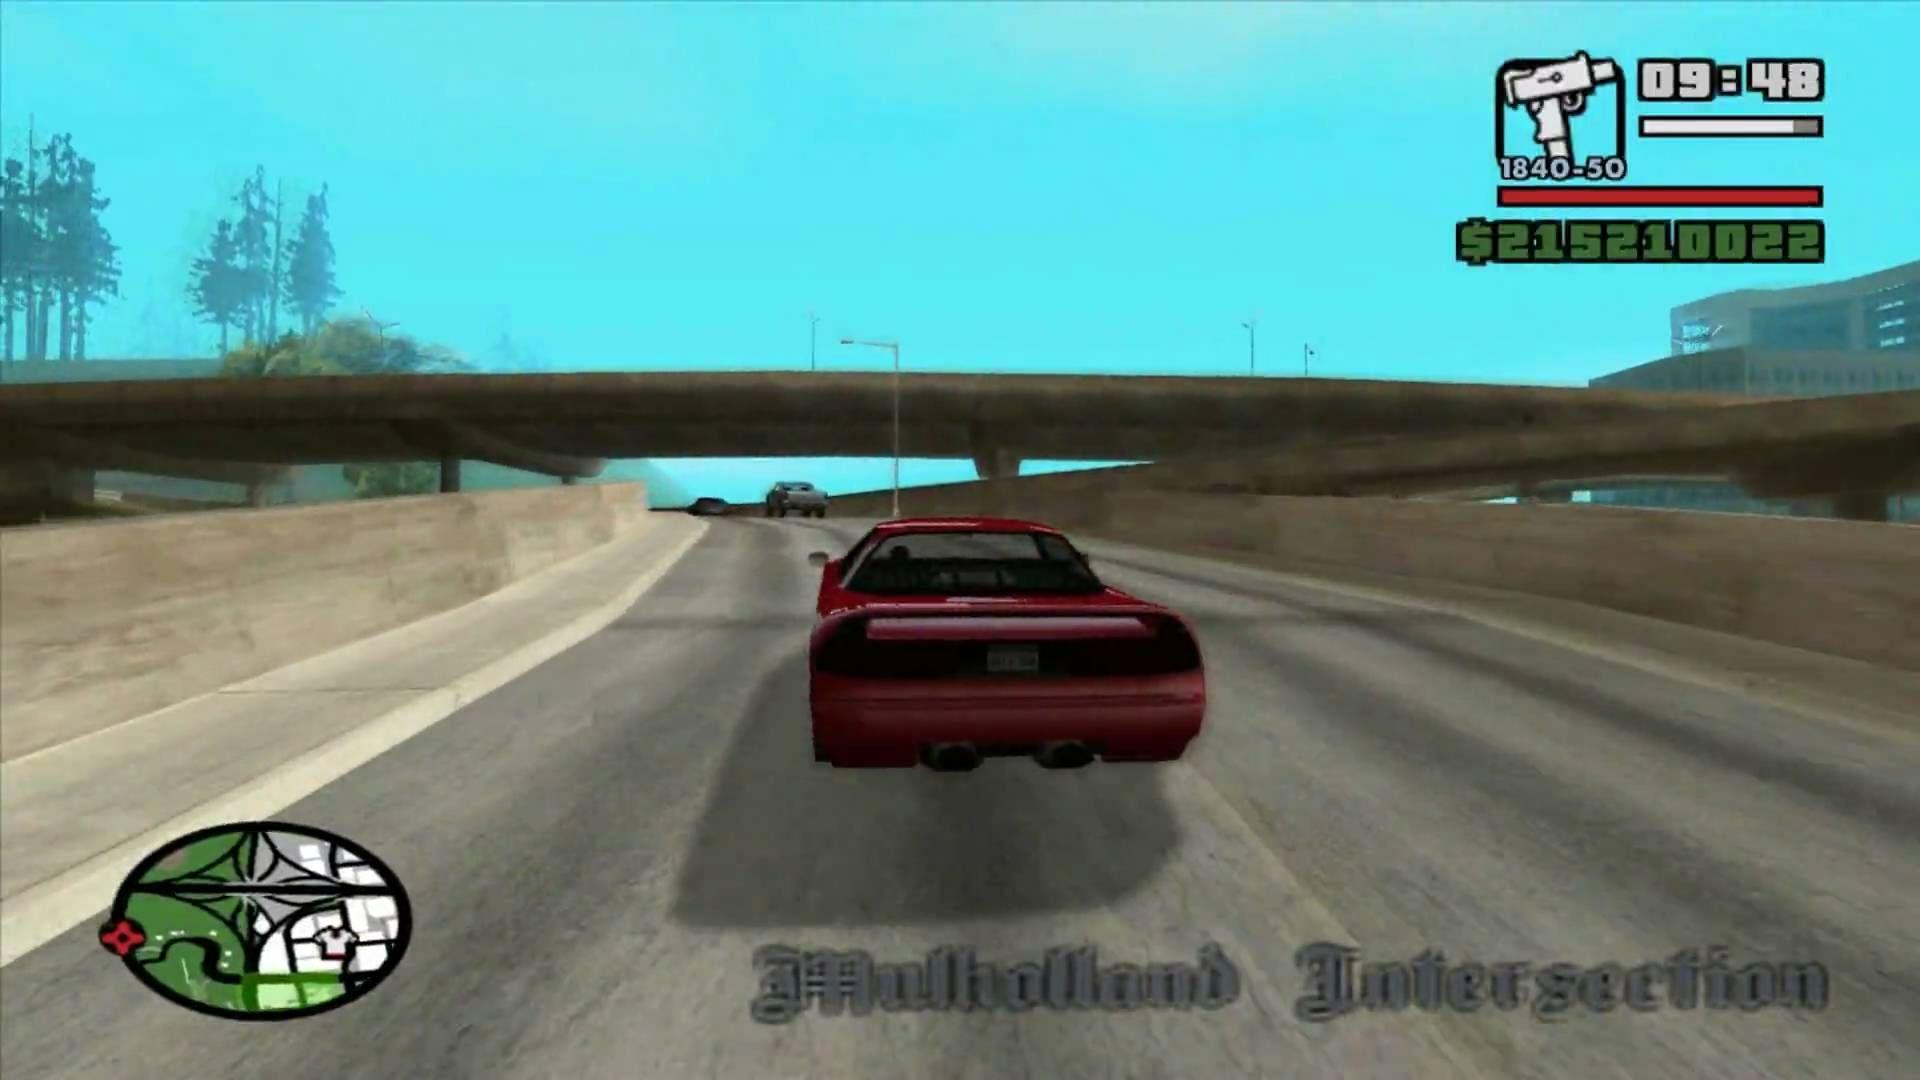 Gta San Andreas Pc Random Gameplay Hd With Images San